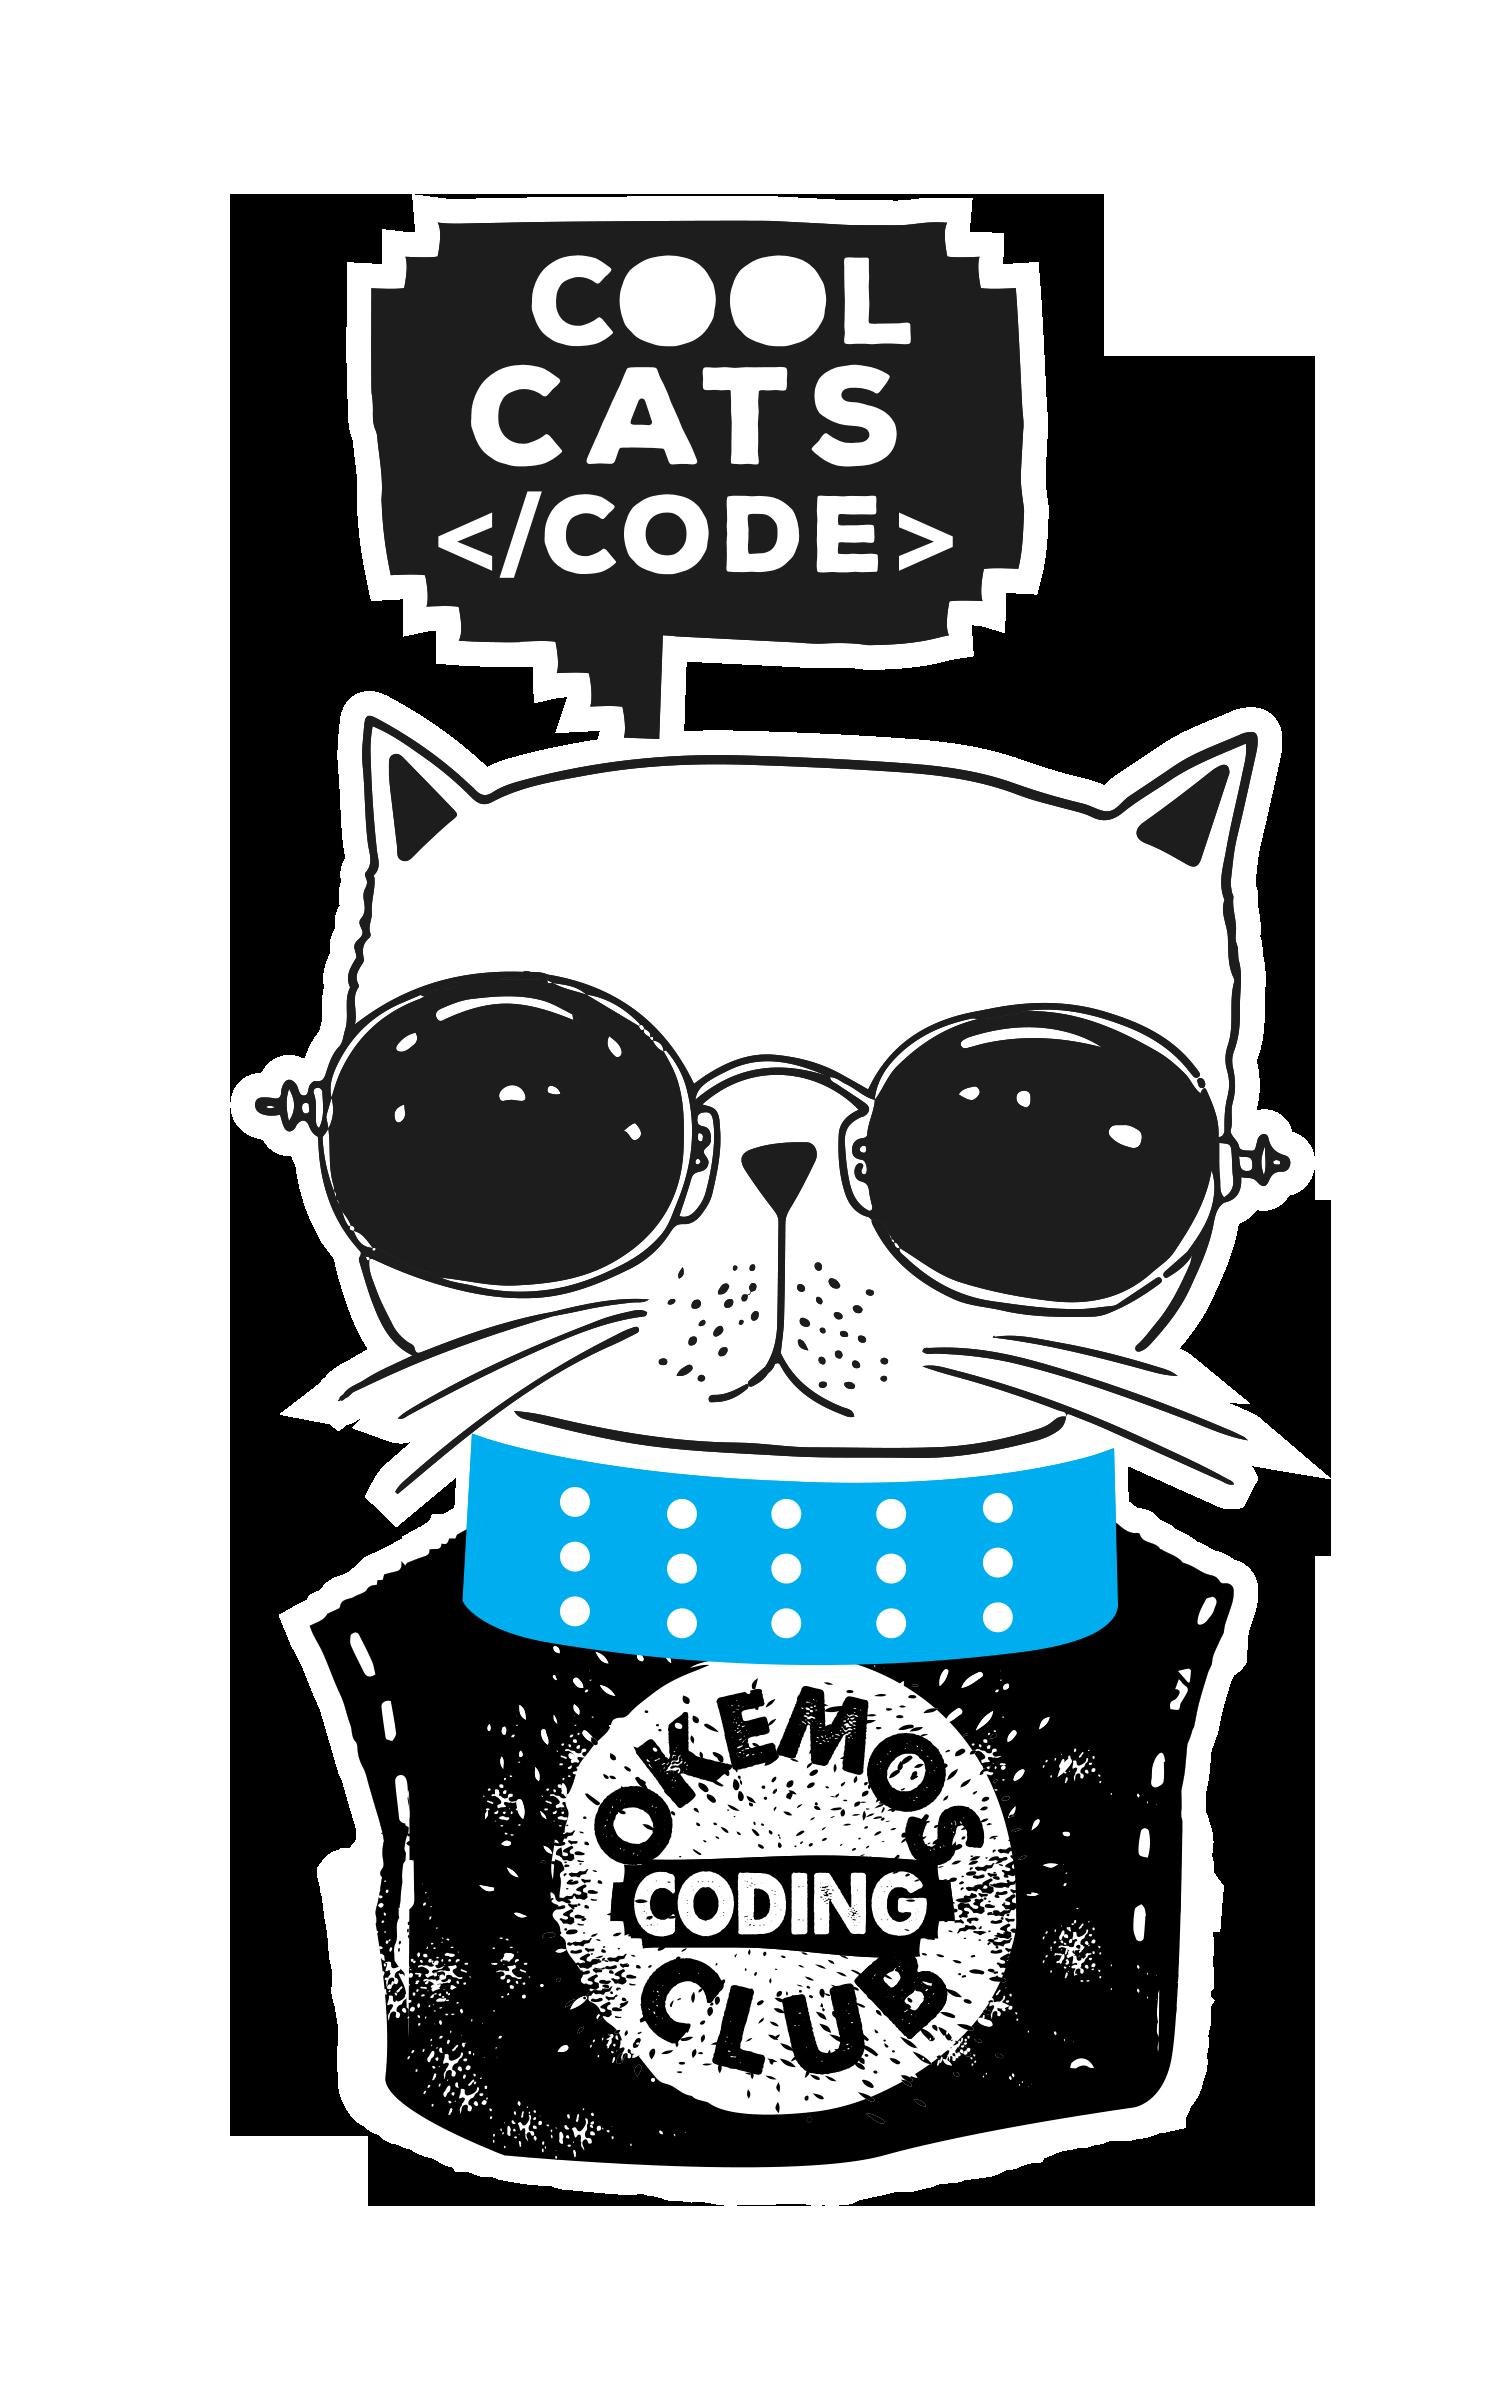 Okemos_Coding_Club_logo.png